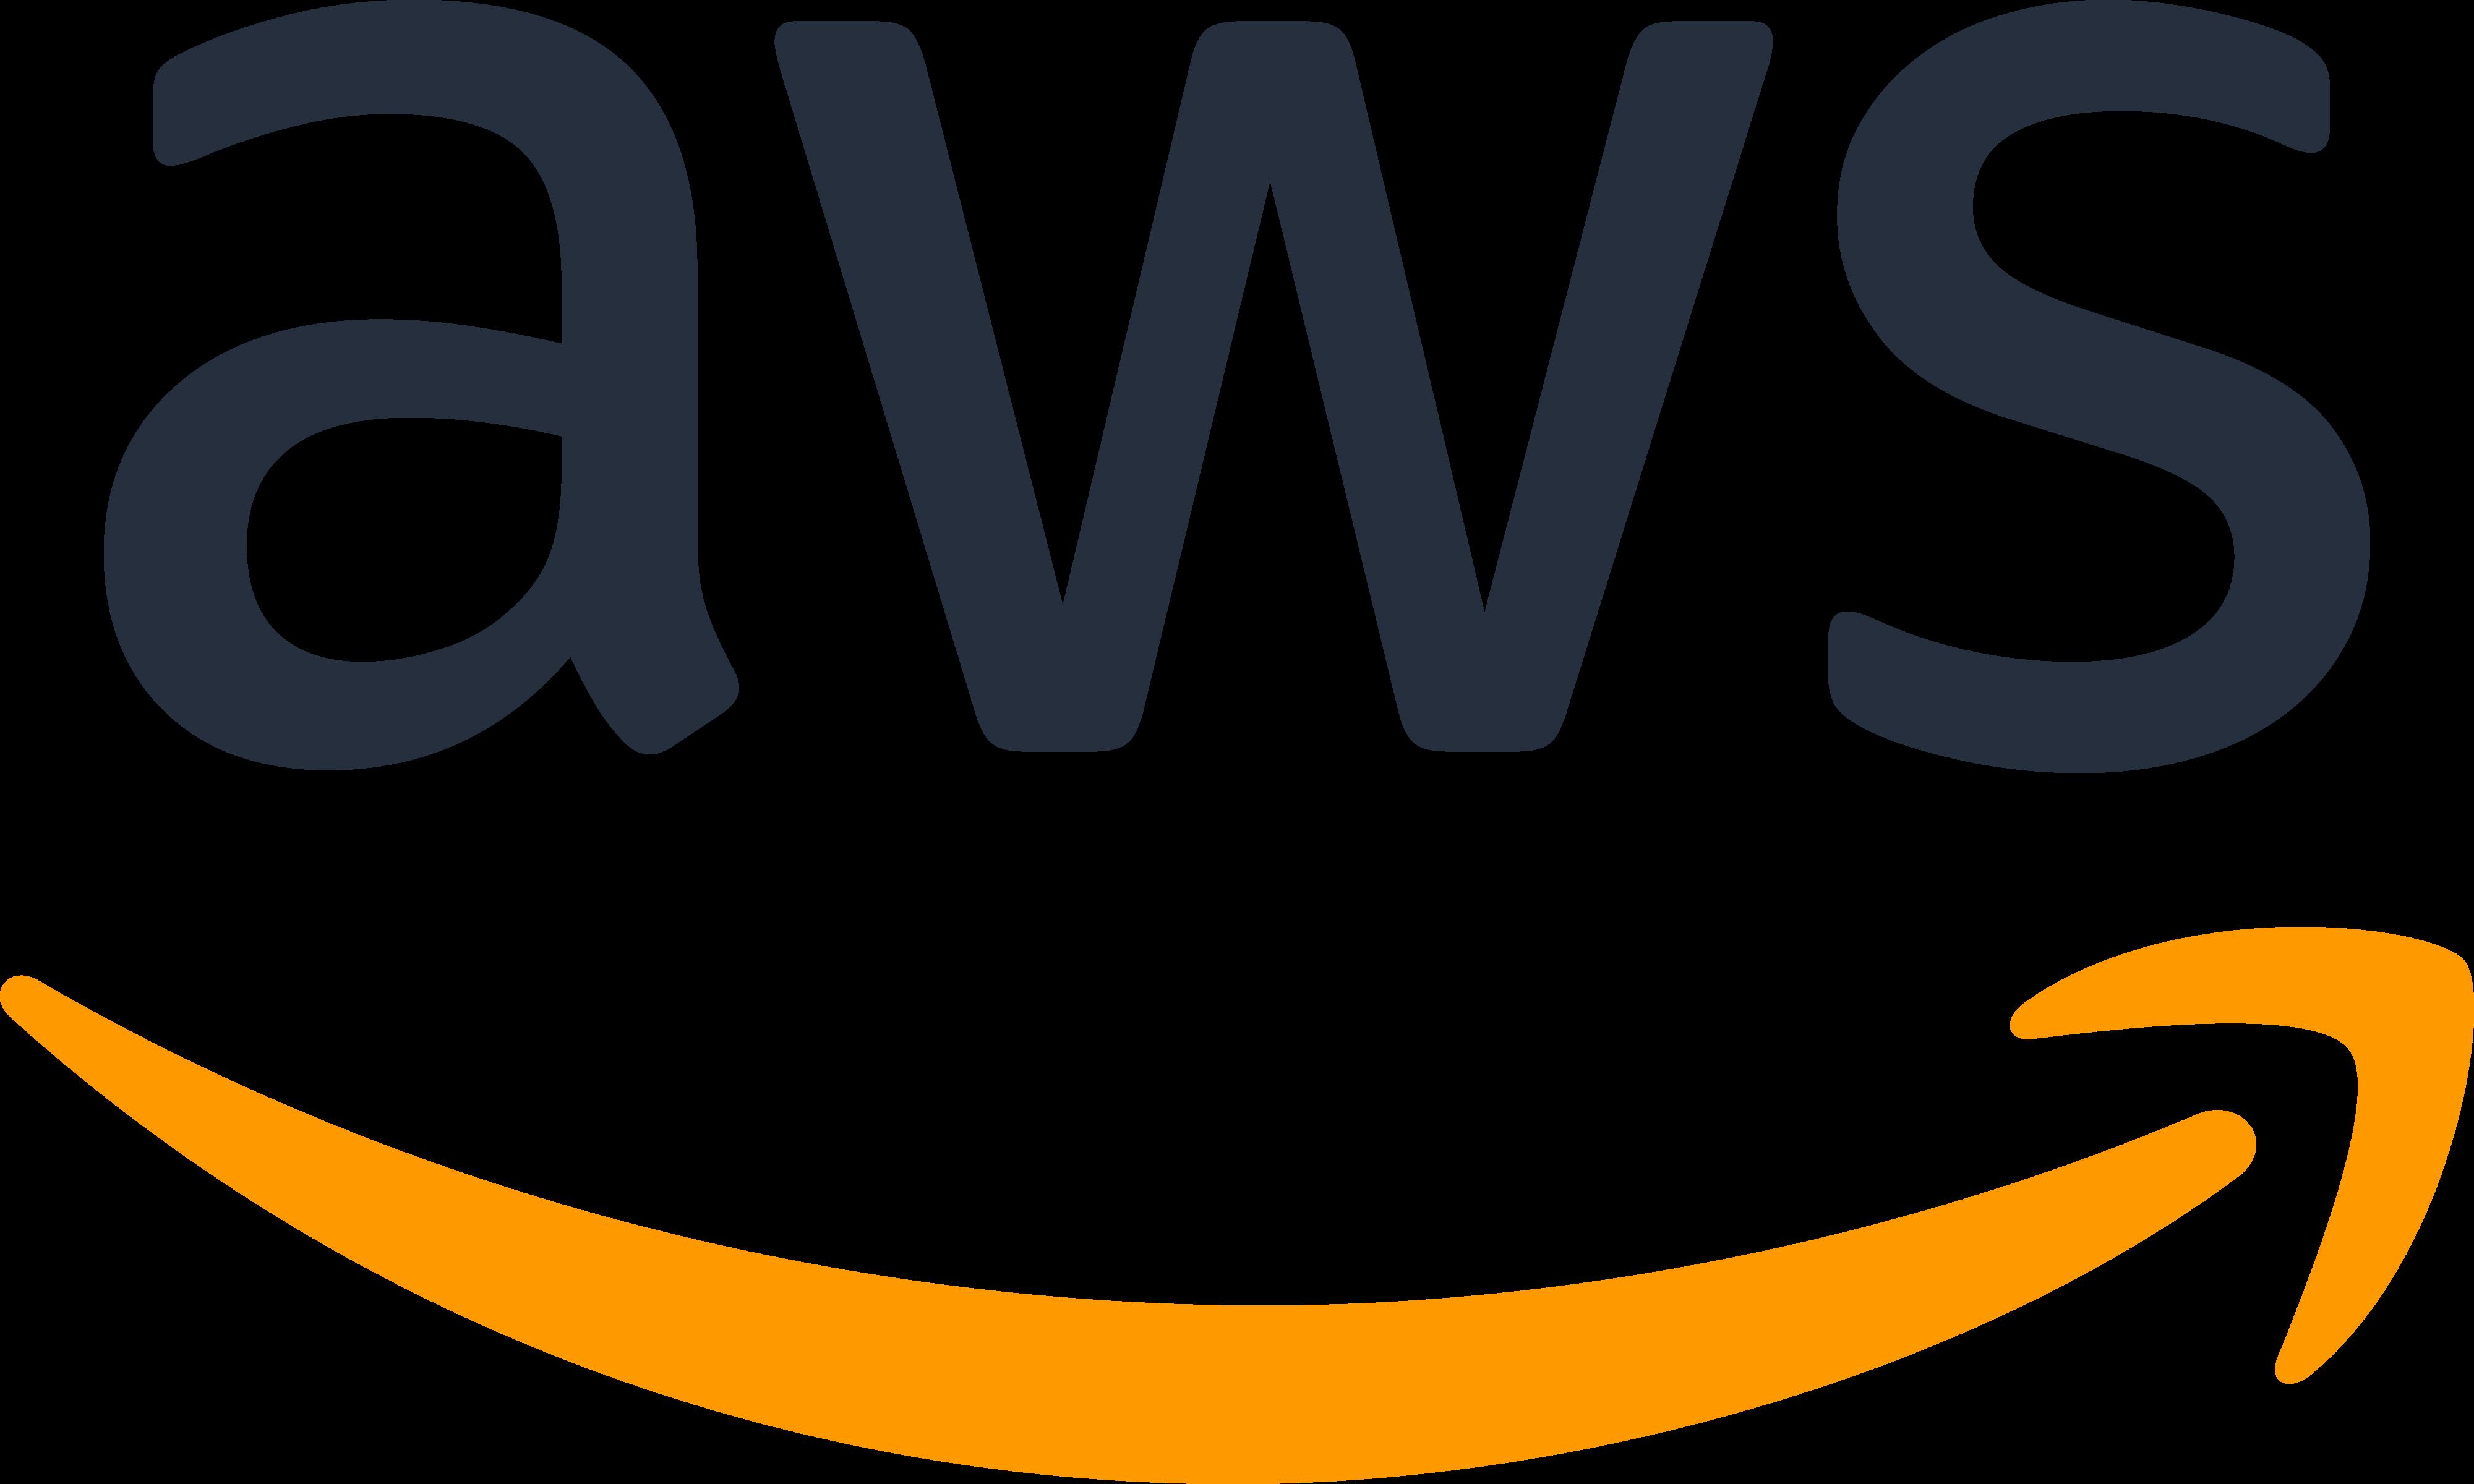 AWS (Amazon Web Services) Integration